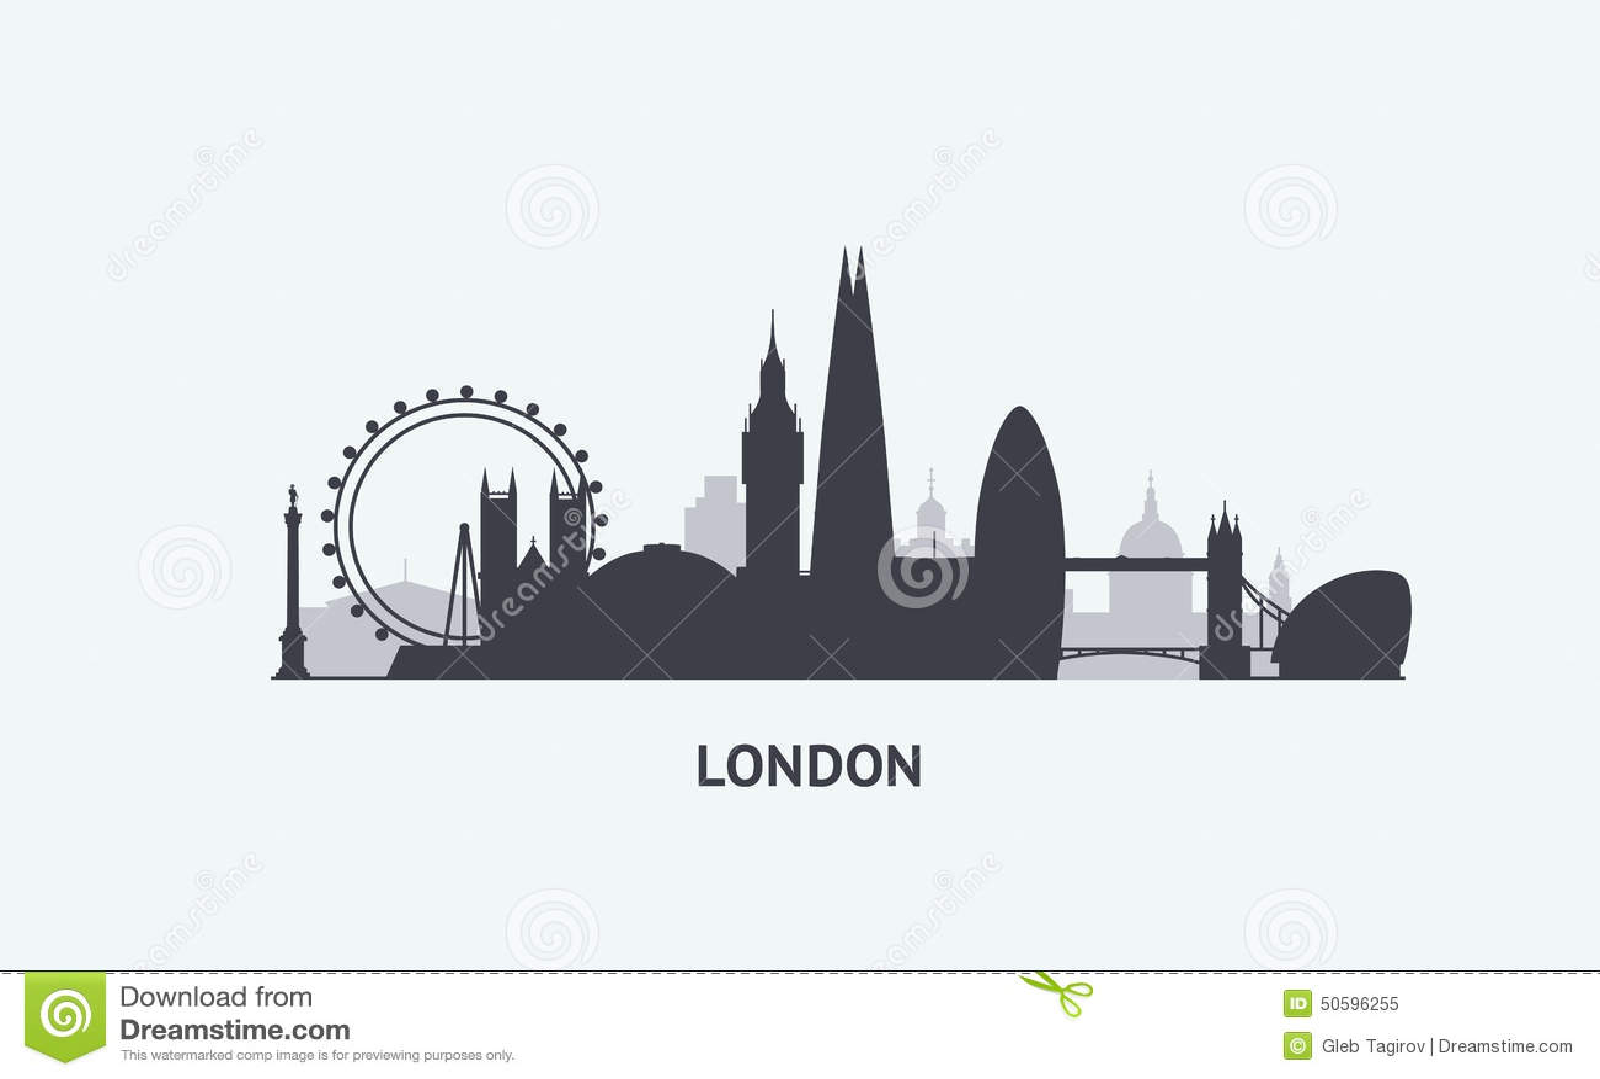 London Skyline Silhouette Stock Vector Illustration Of Europe